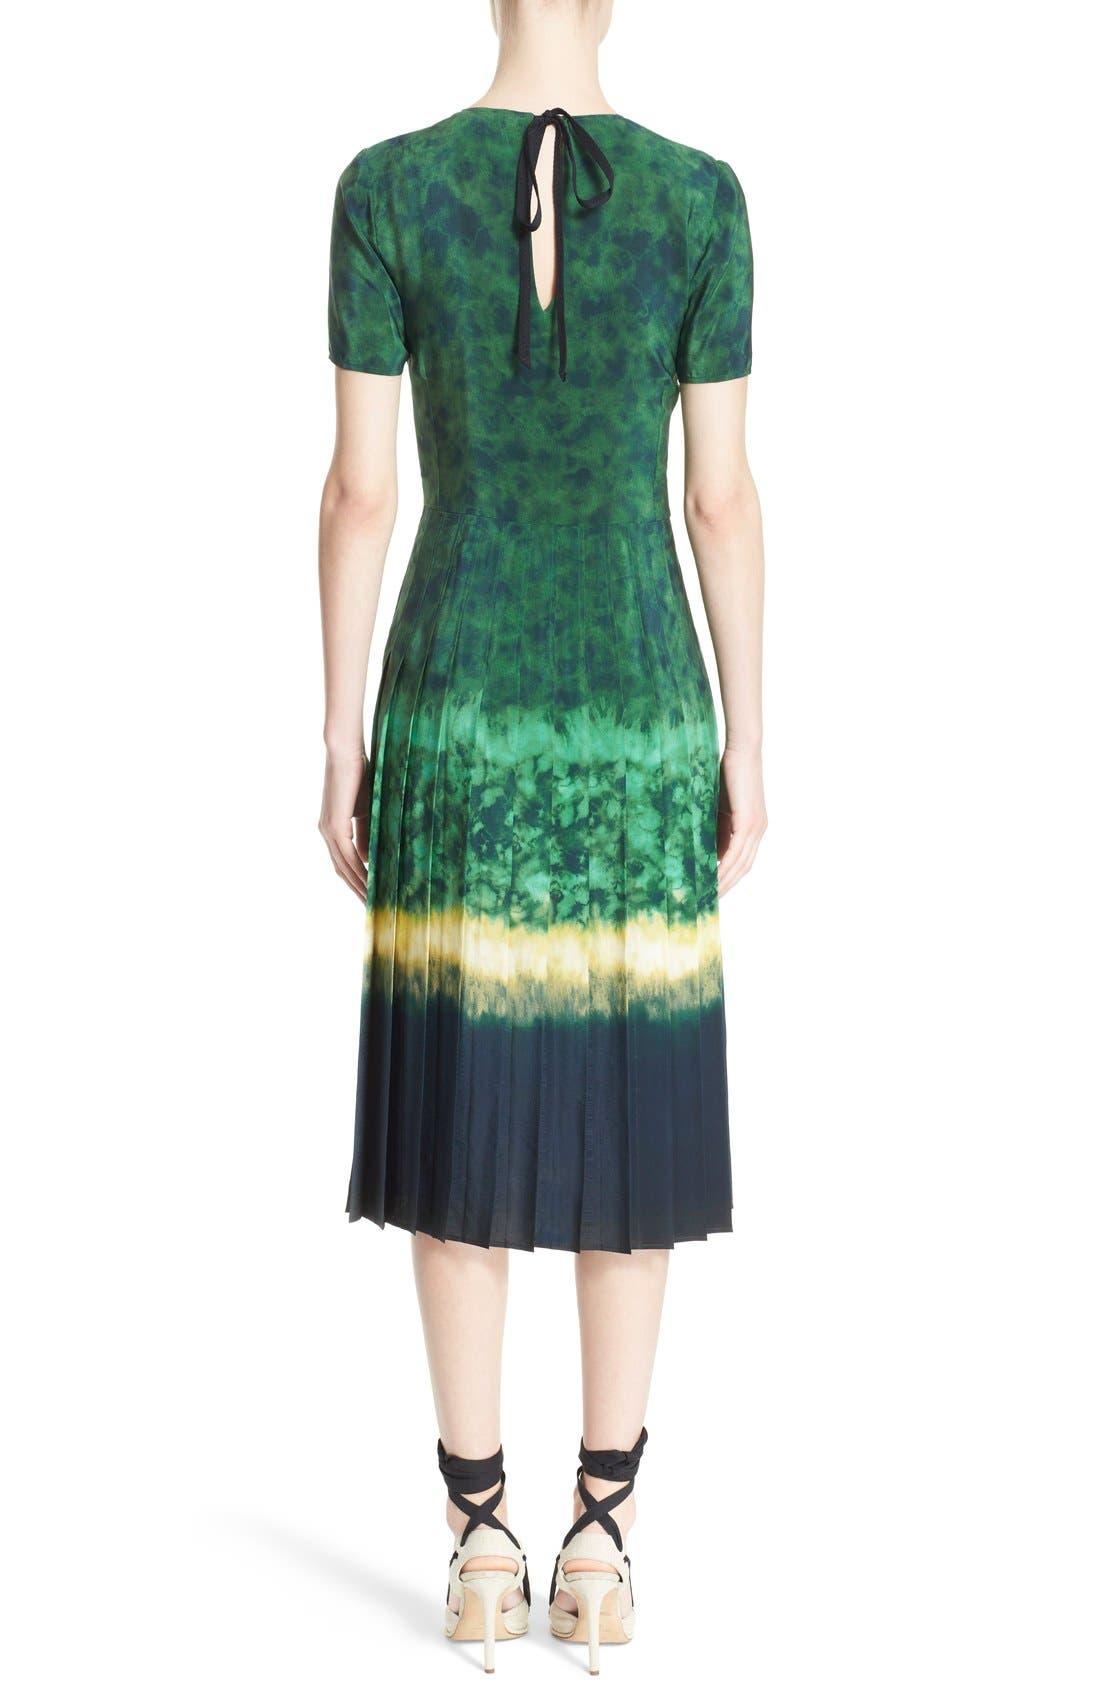 ALTUZARRA, 'Ilari' Rope Closure Dip Dye Dress, Alternate thumbnail 3, color, 340